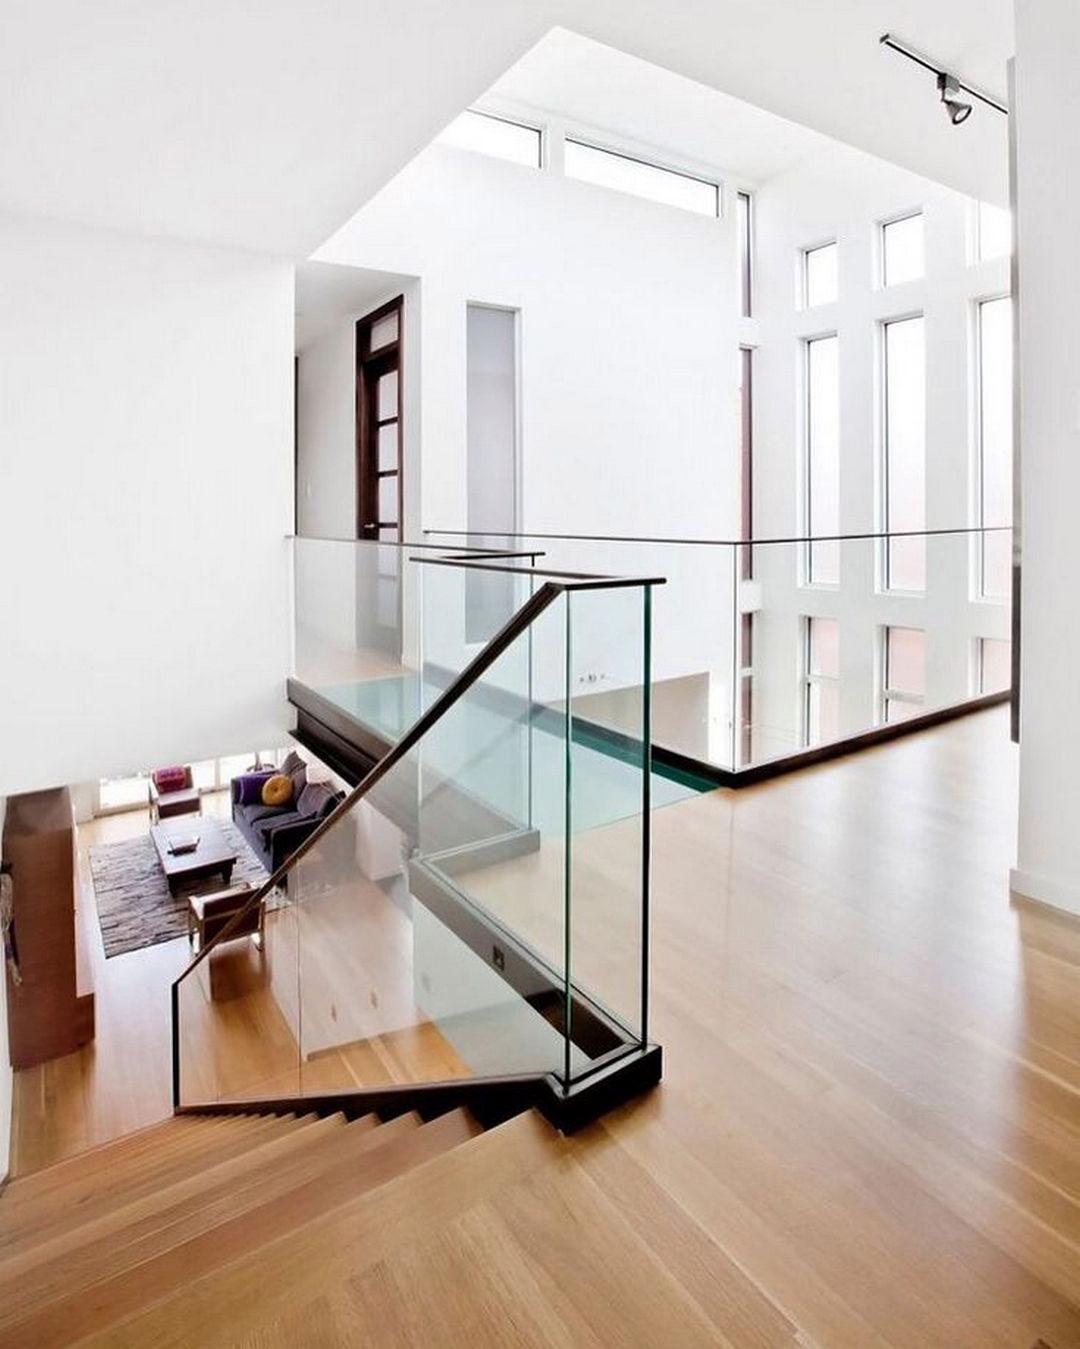 Superbe 64 Sleek Modern Interior Decorating Ideas  Https://www.futuristarchitecture.com/13453 Modern Interior Decorating.html